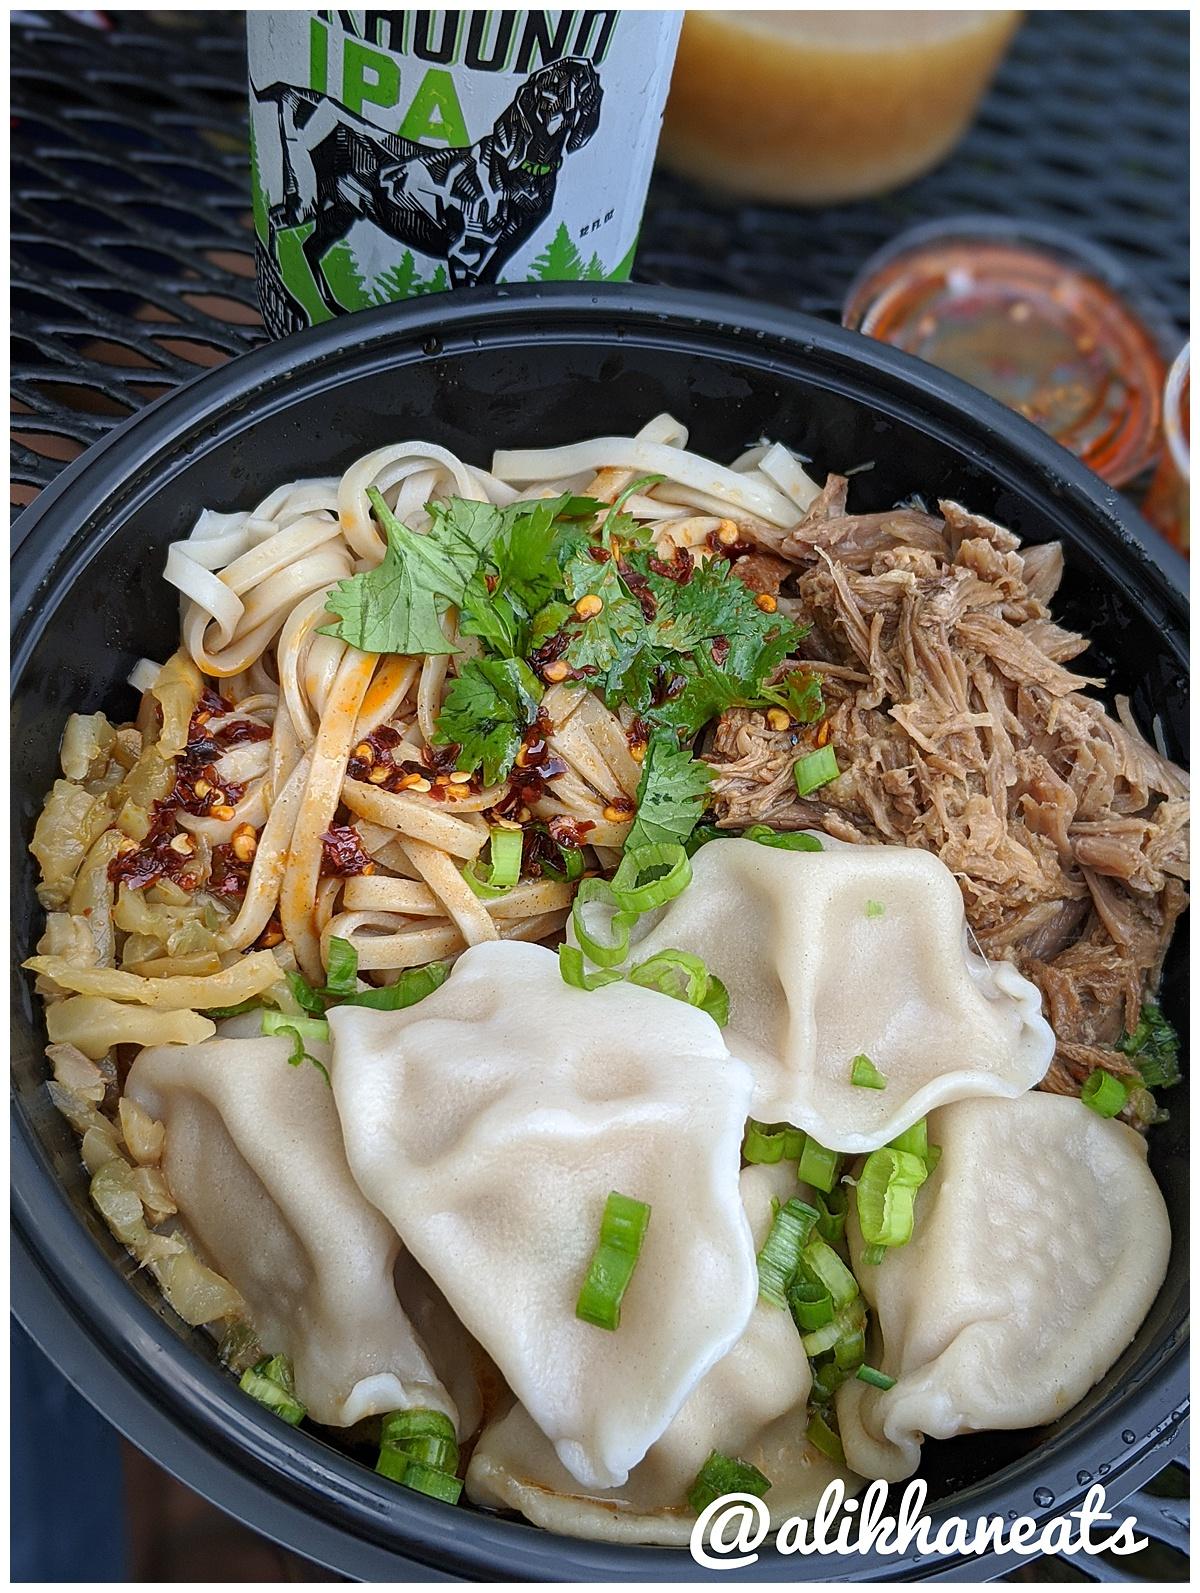 Three Fold Noodle and Dumpling Co dumplings